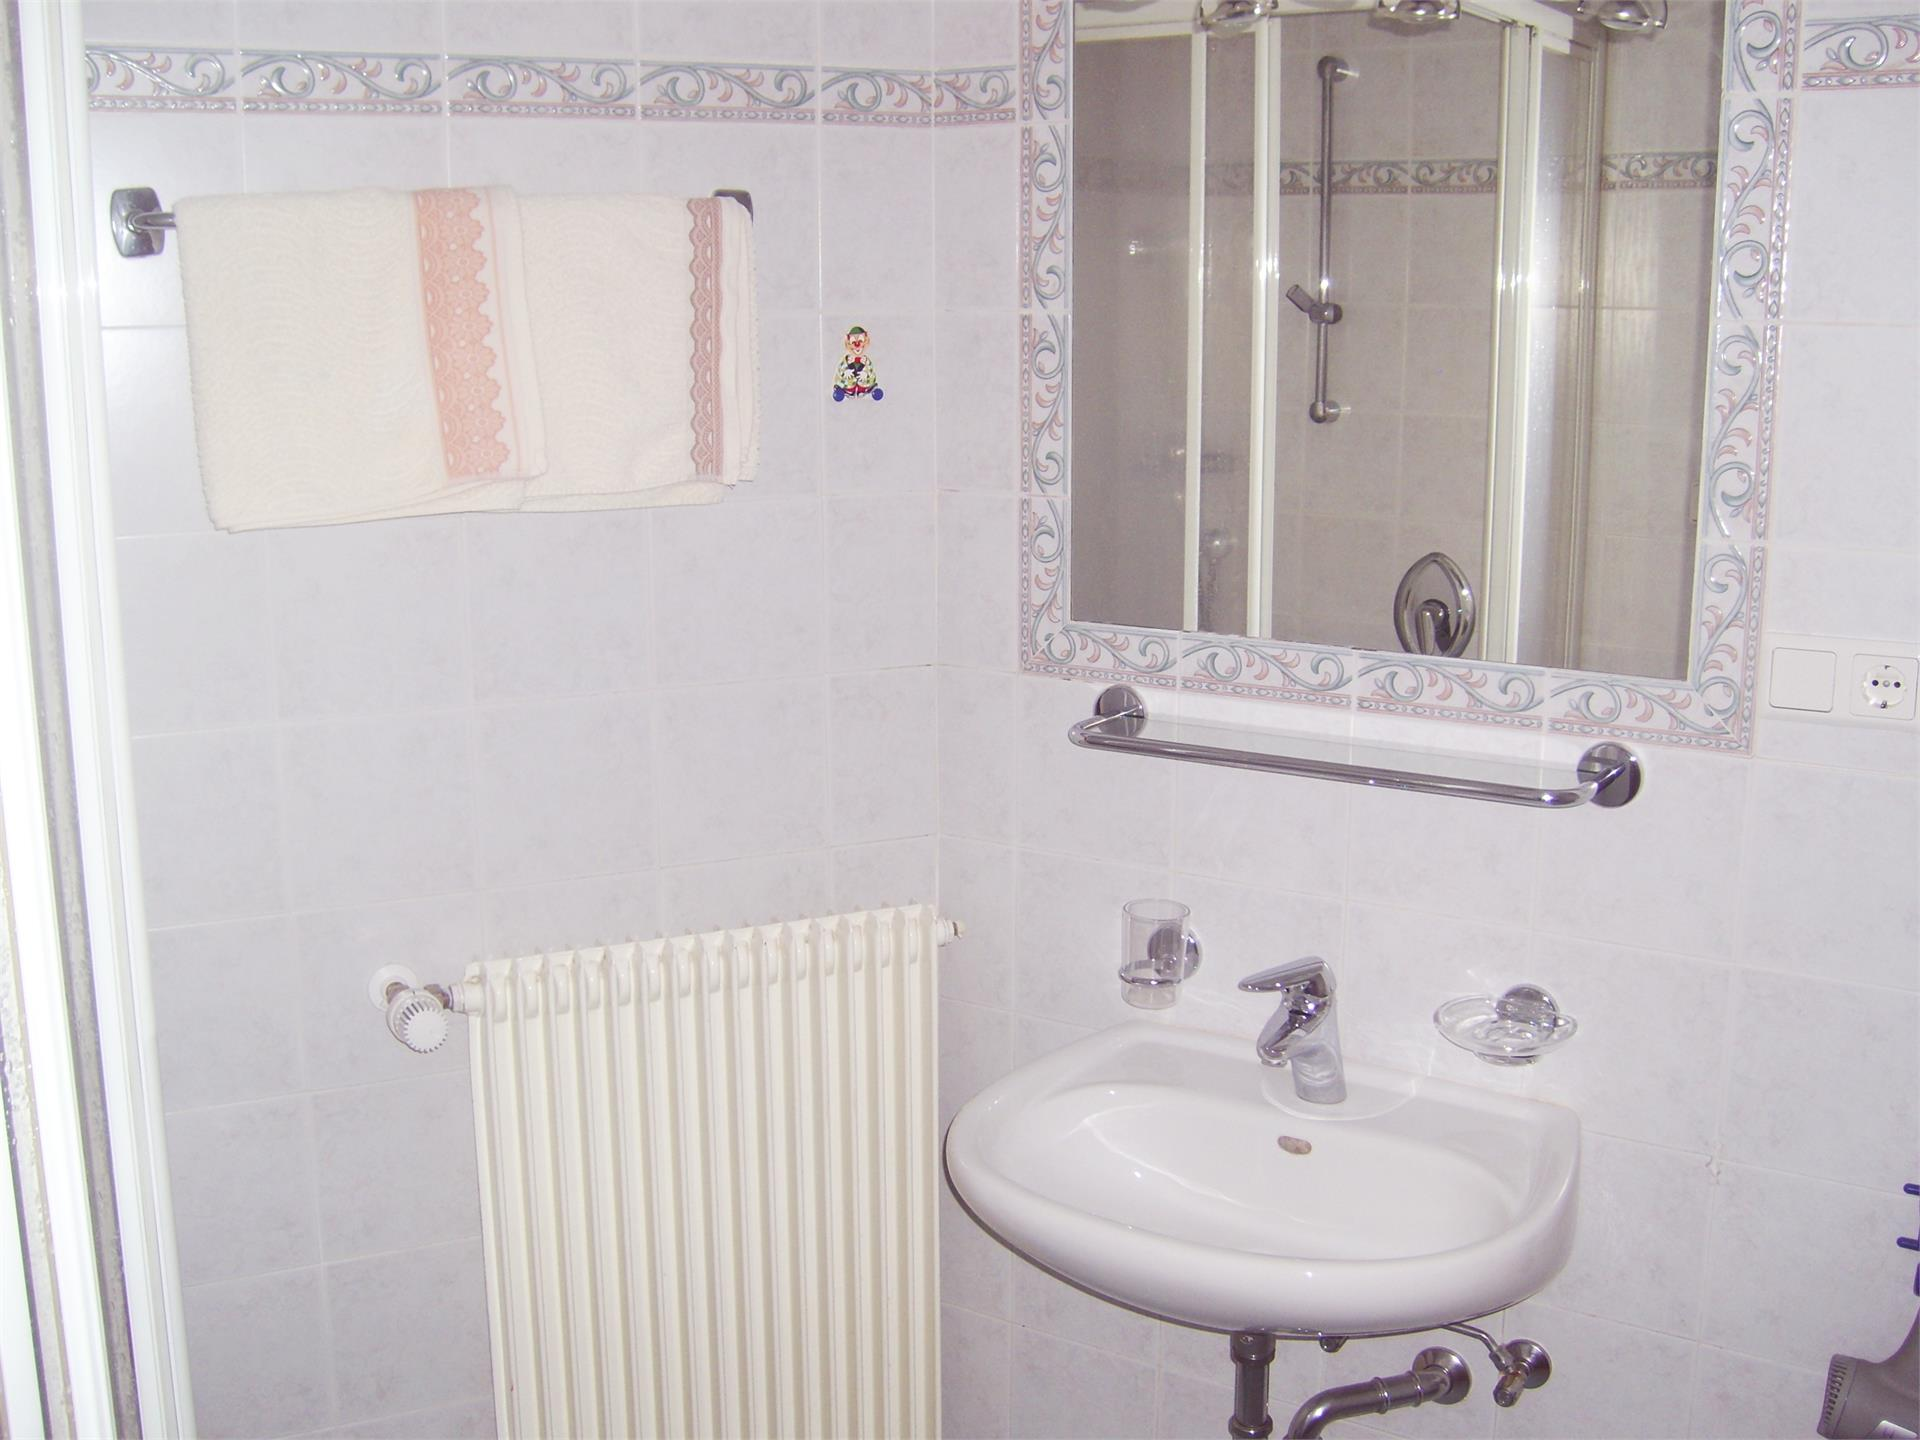 Appartment 8 Badezimmer